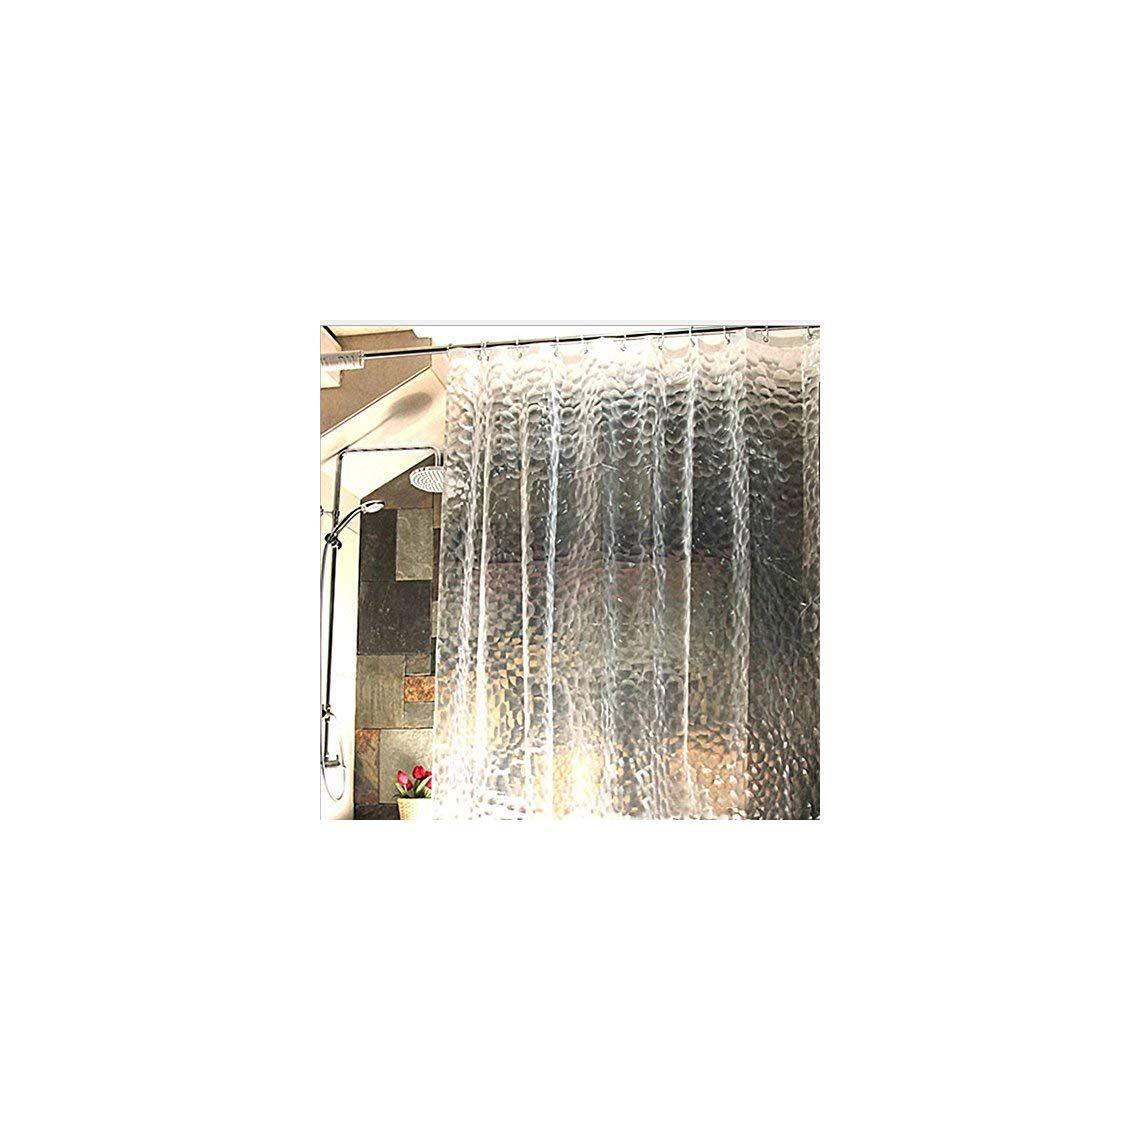 HomeIdeas 3d Cube Shower CurtainWaterproofMildew FreeShower